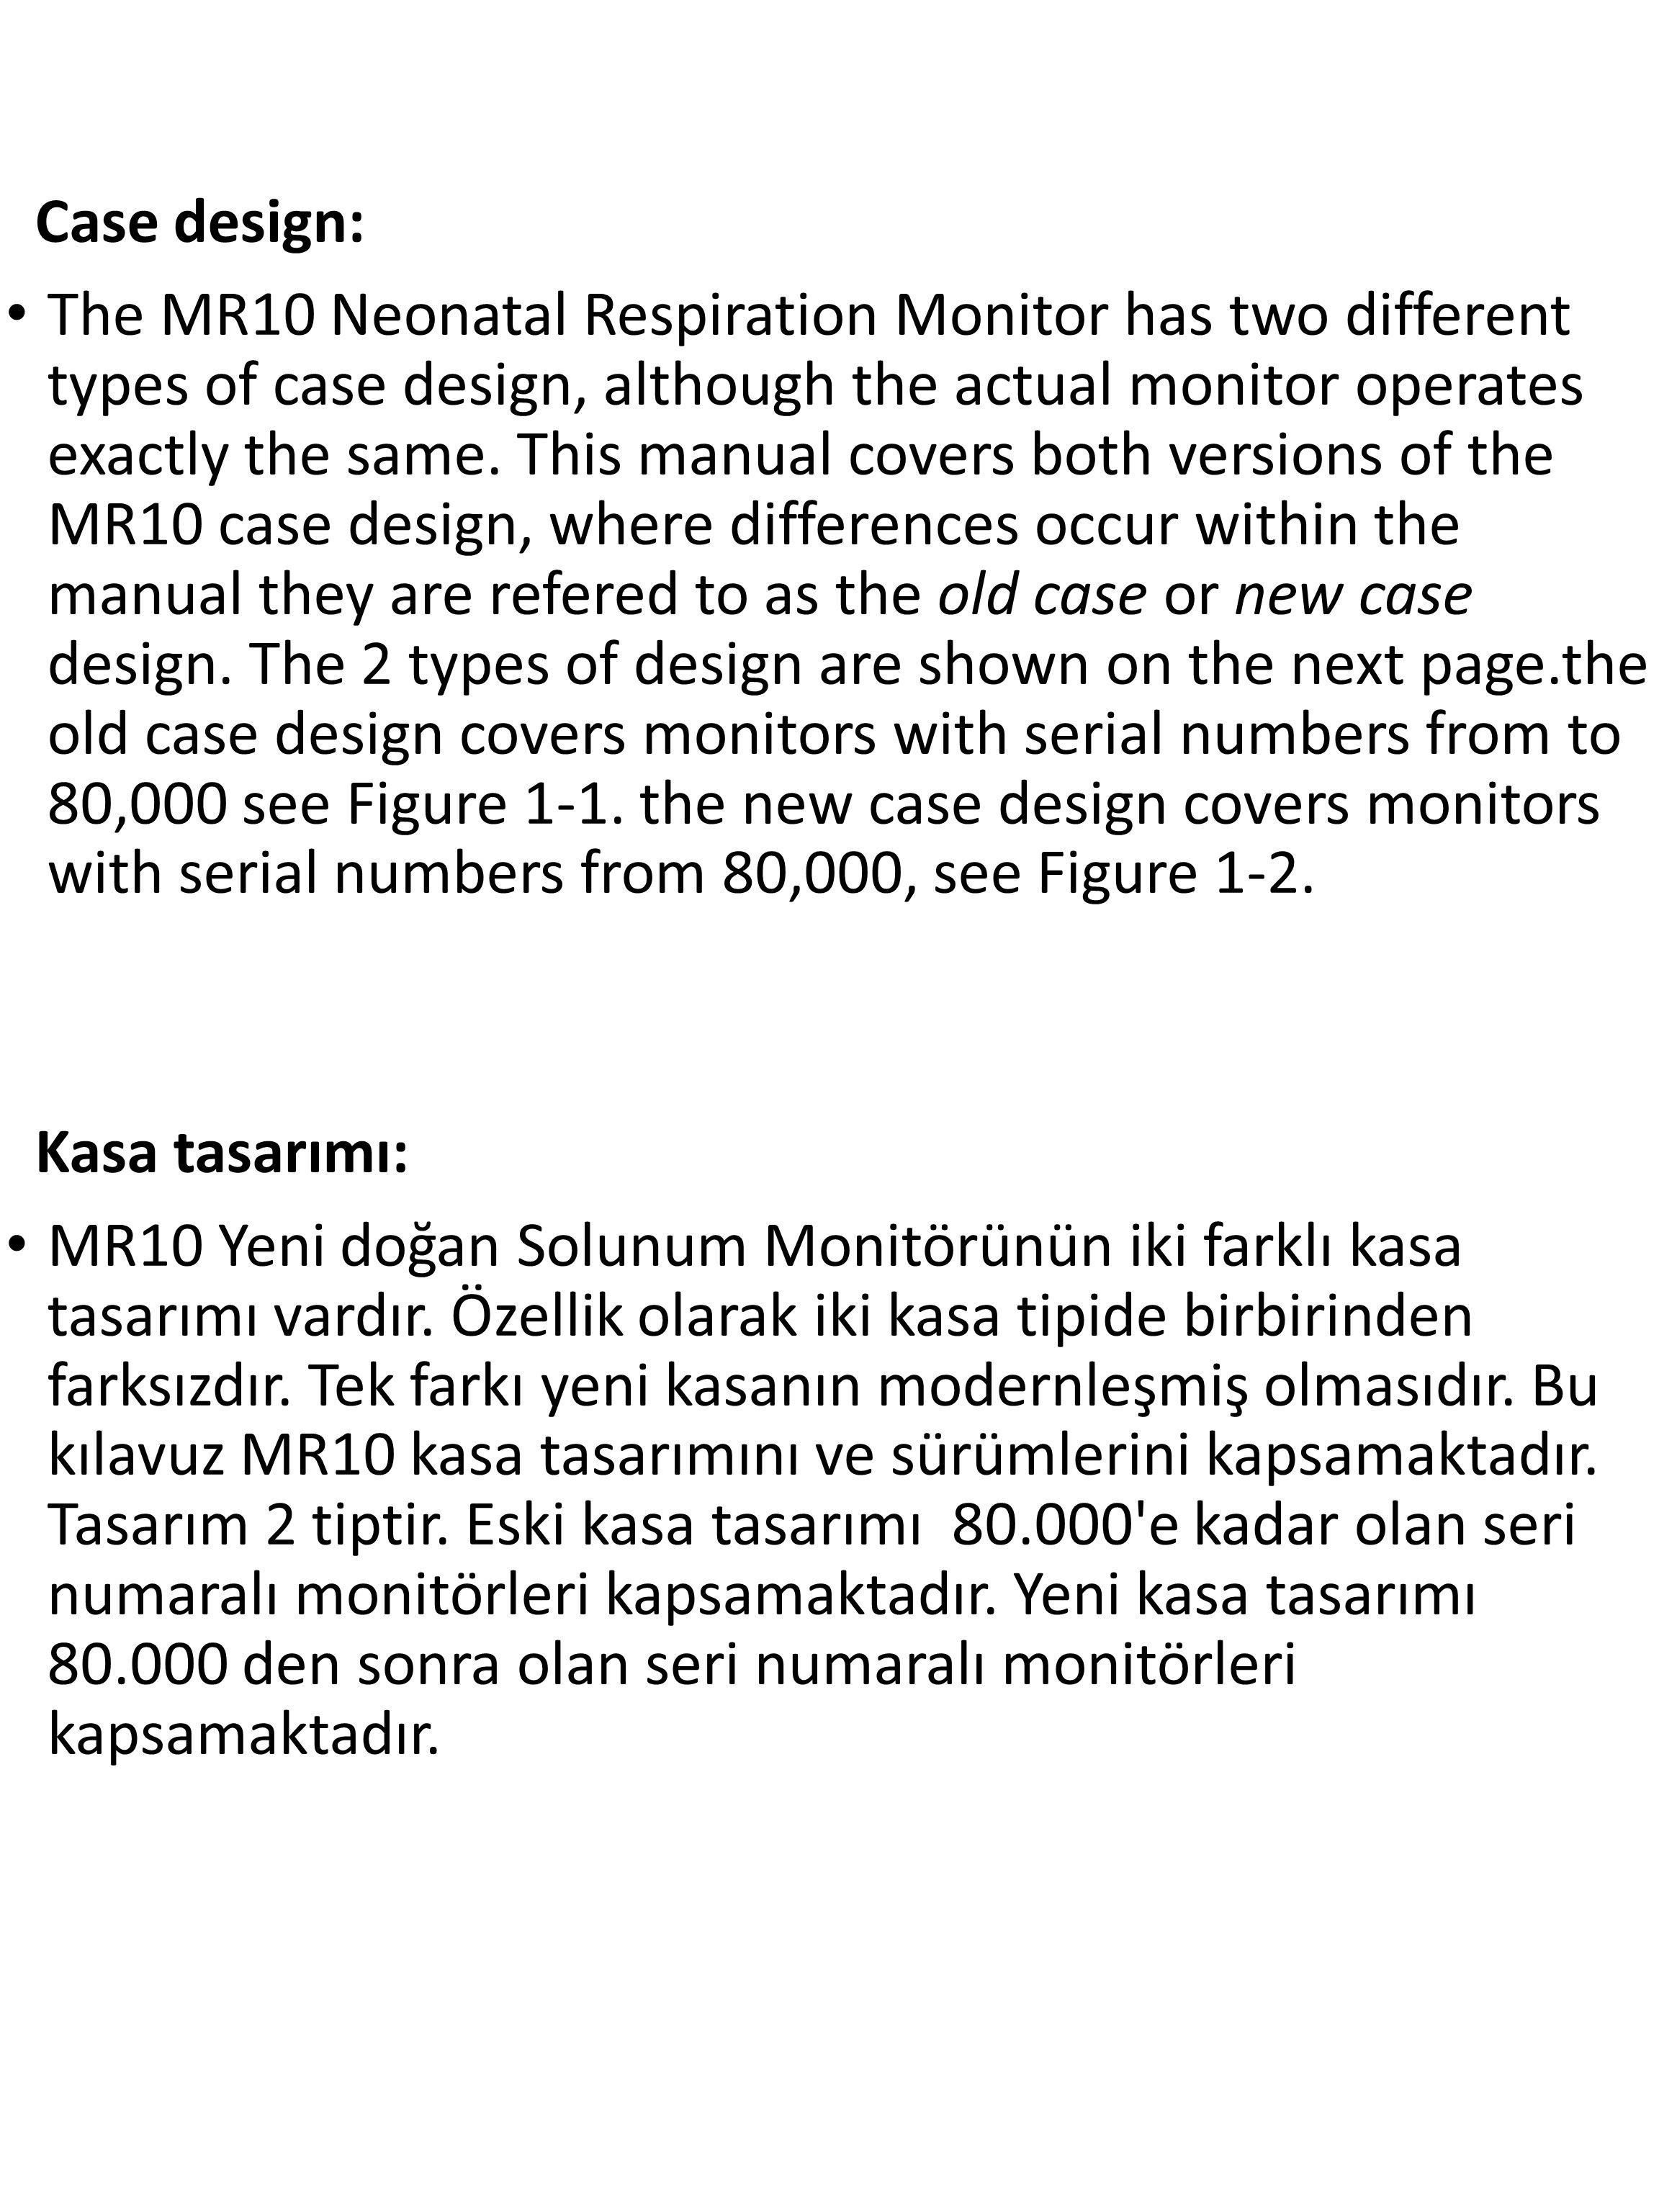 Temizlik ve Bakım Temizlik Cleaning: Routine maintenance is limited to keeping the monitor clean.